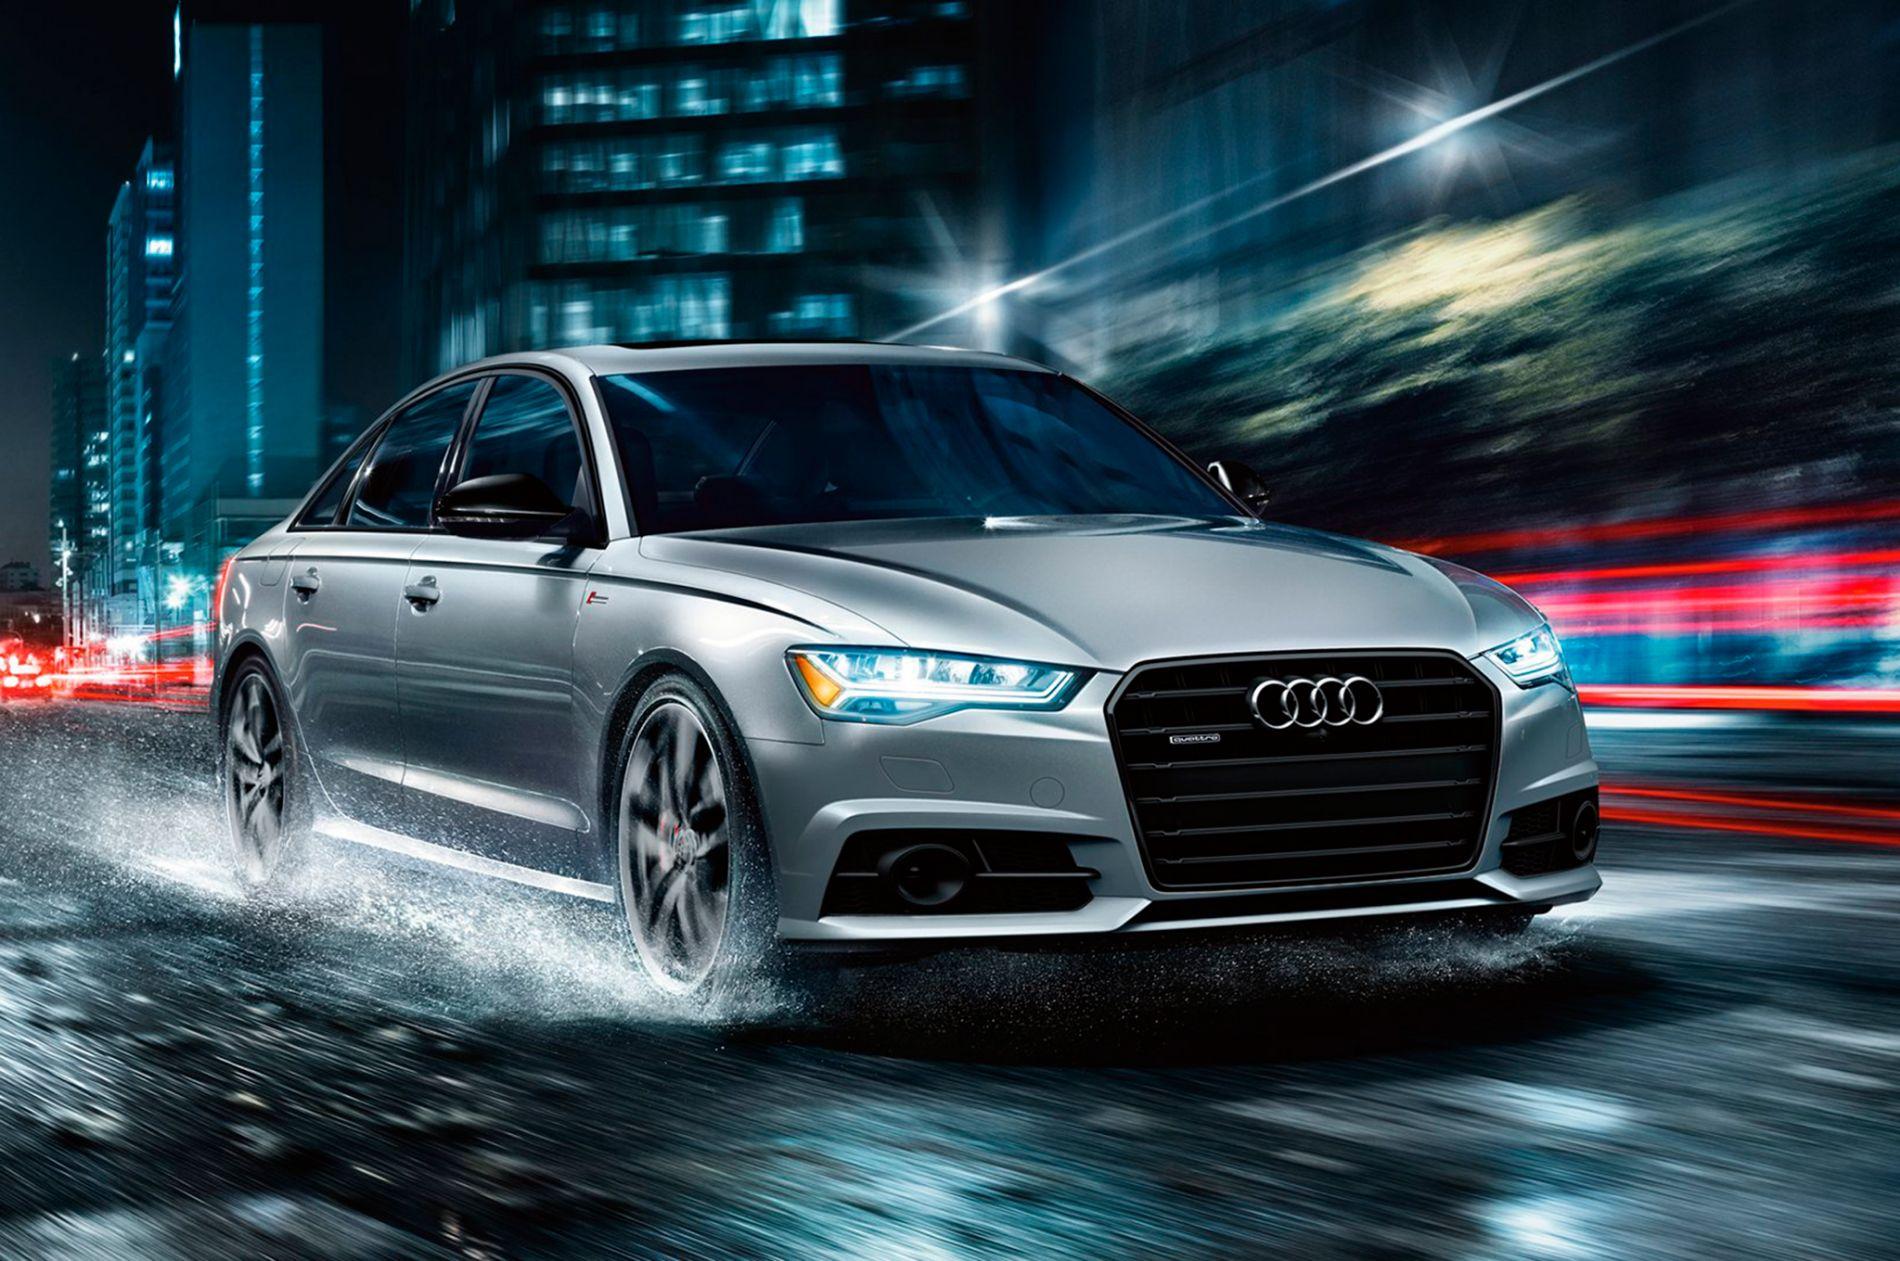 2018-Audi-A6-Prestige